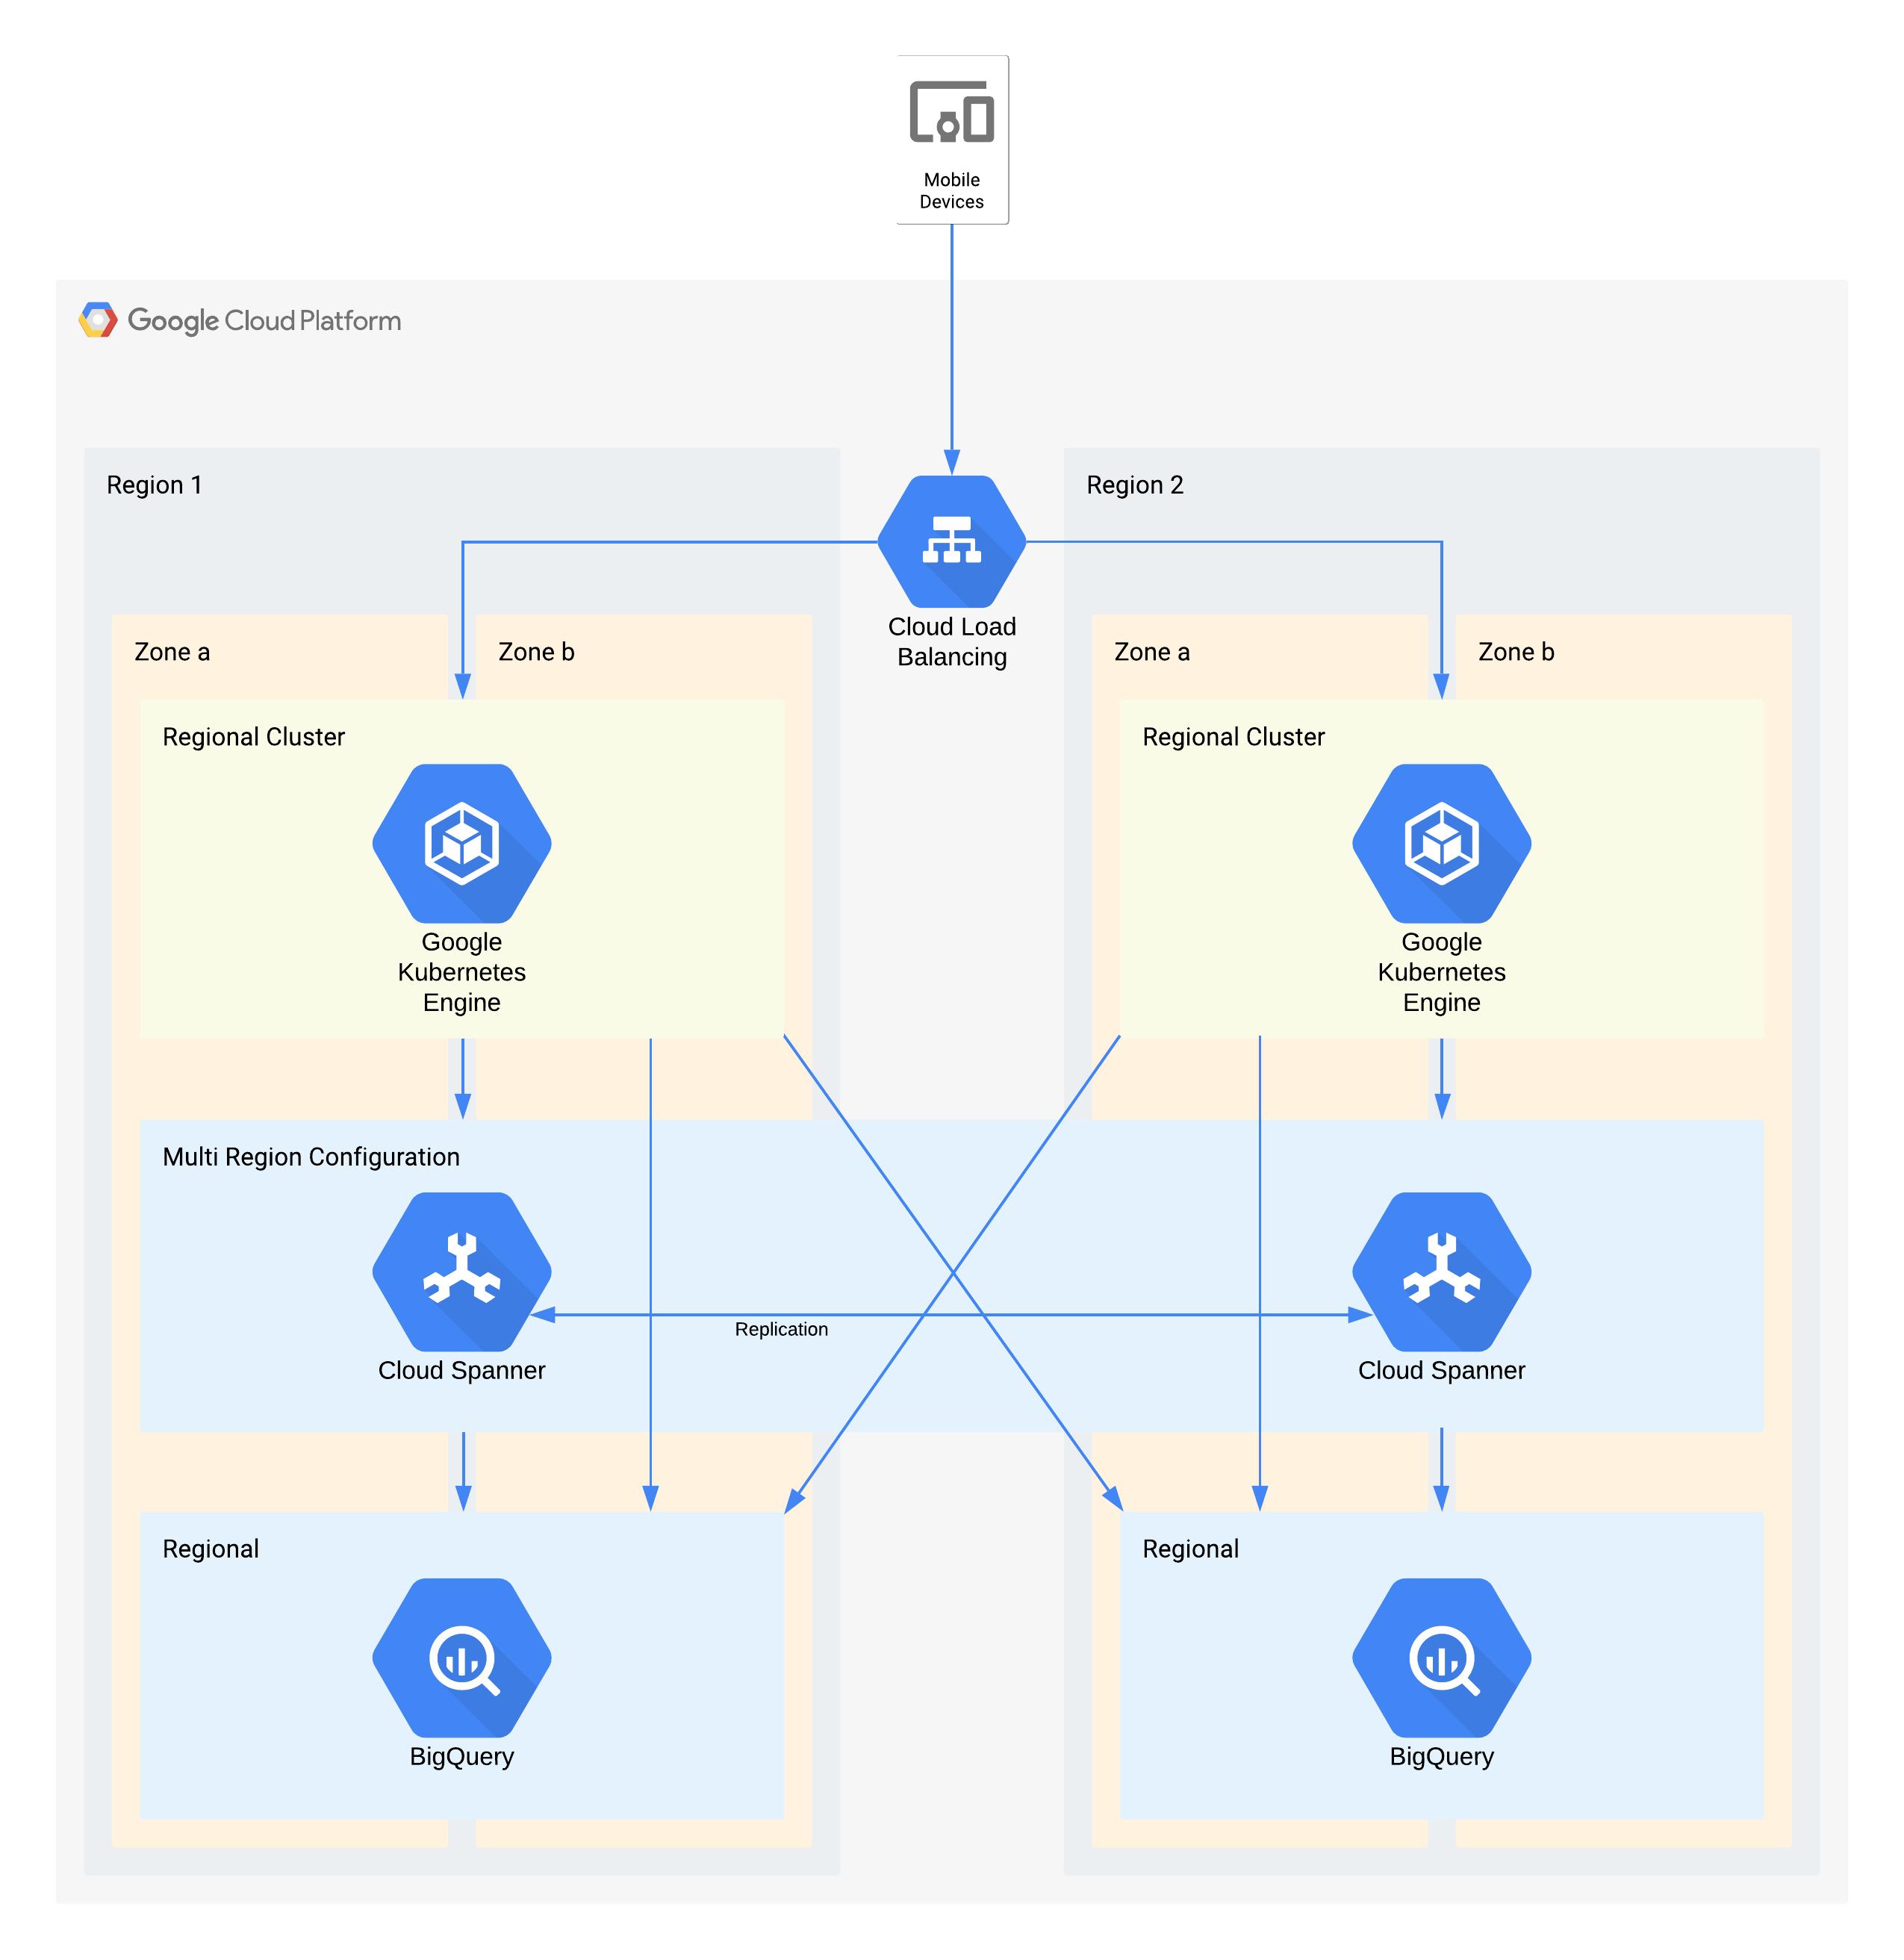 Google Cloud 제품을 사용하는 등급 1 아키텍처 예시